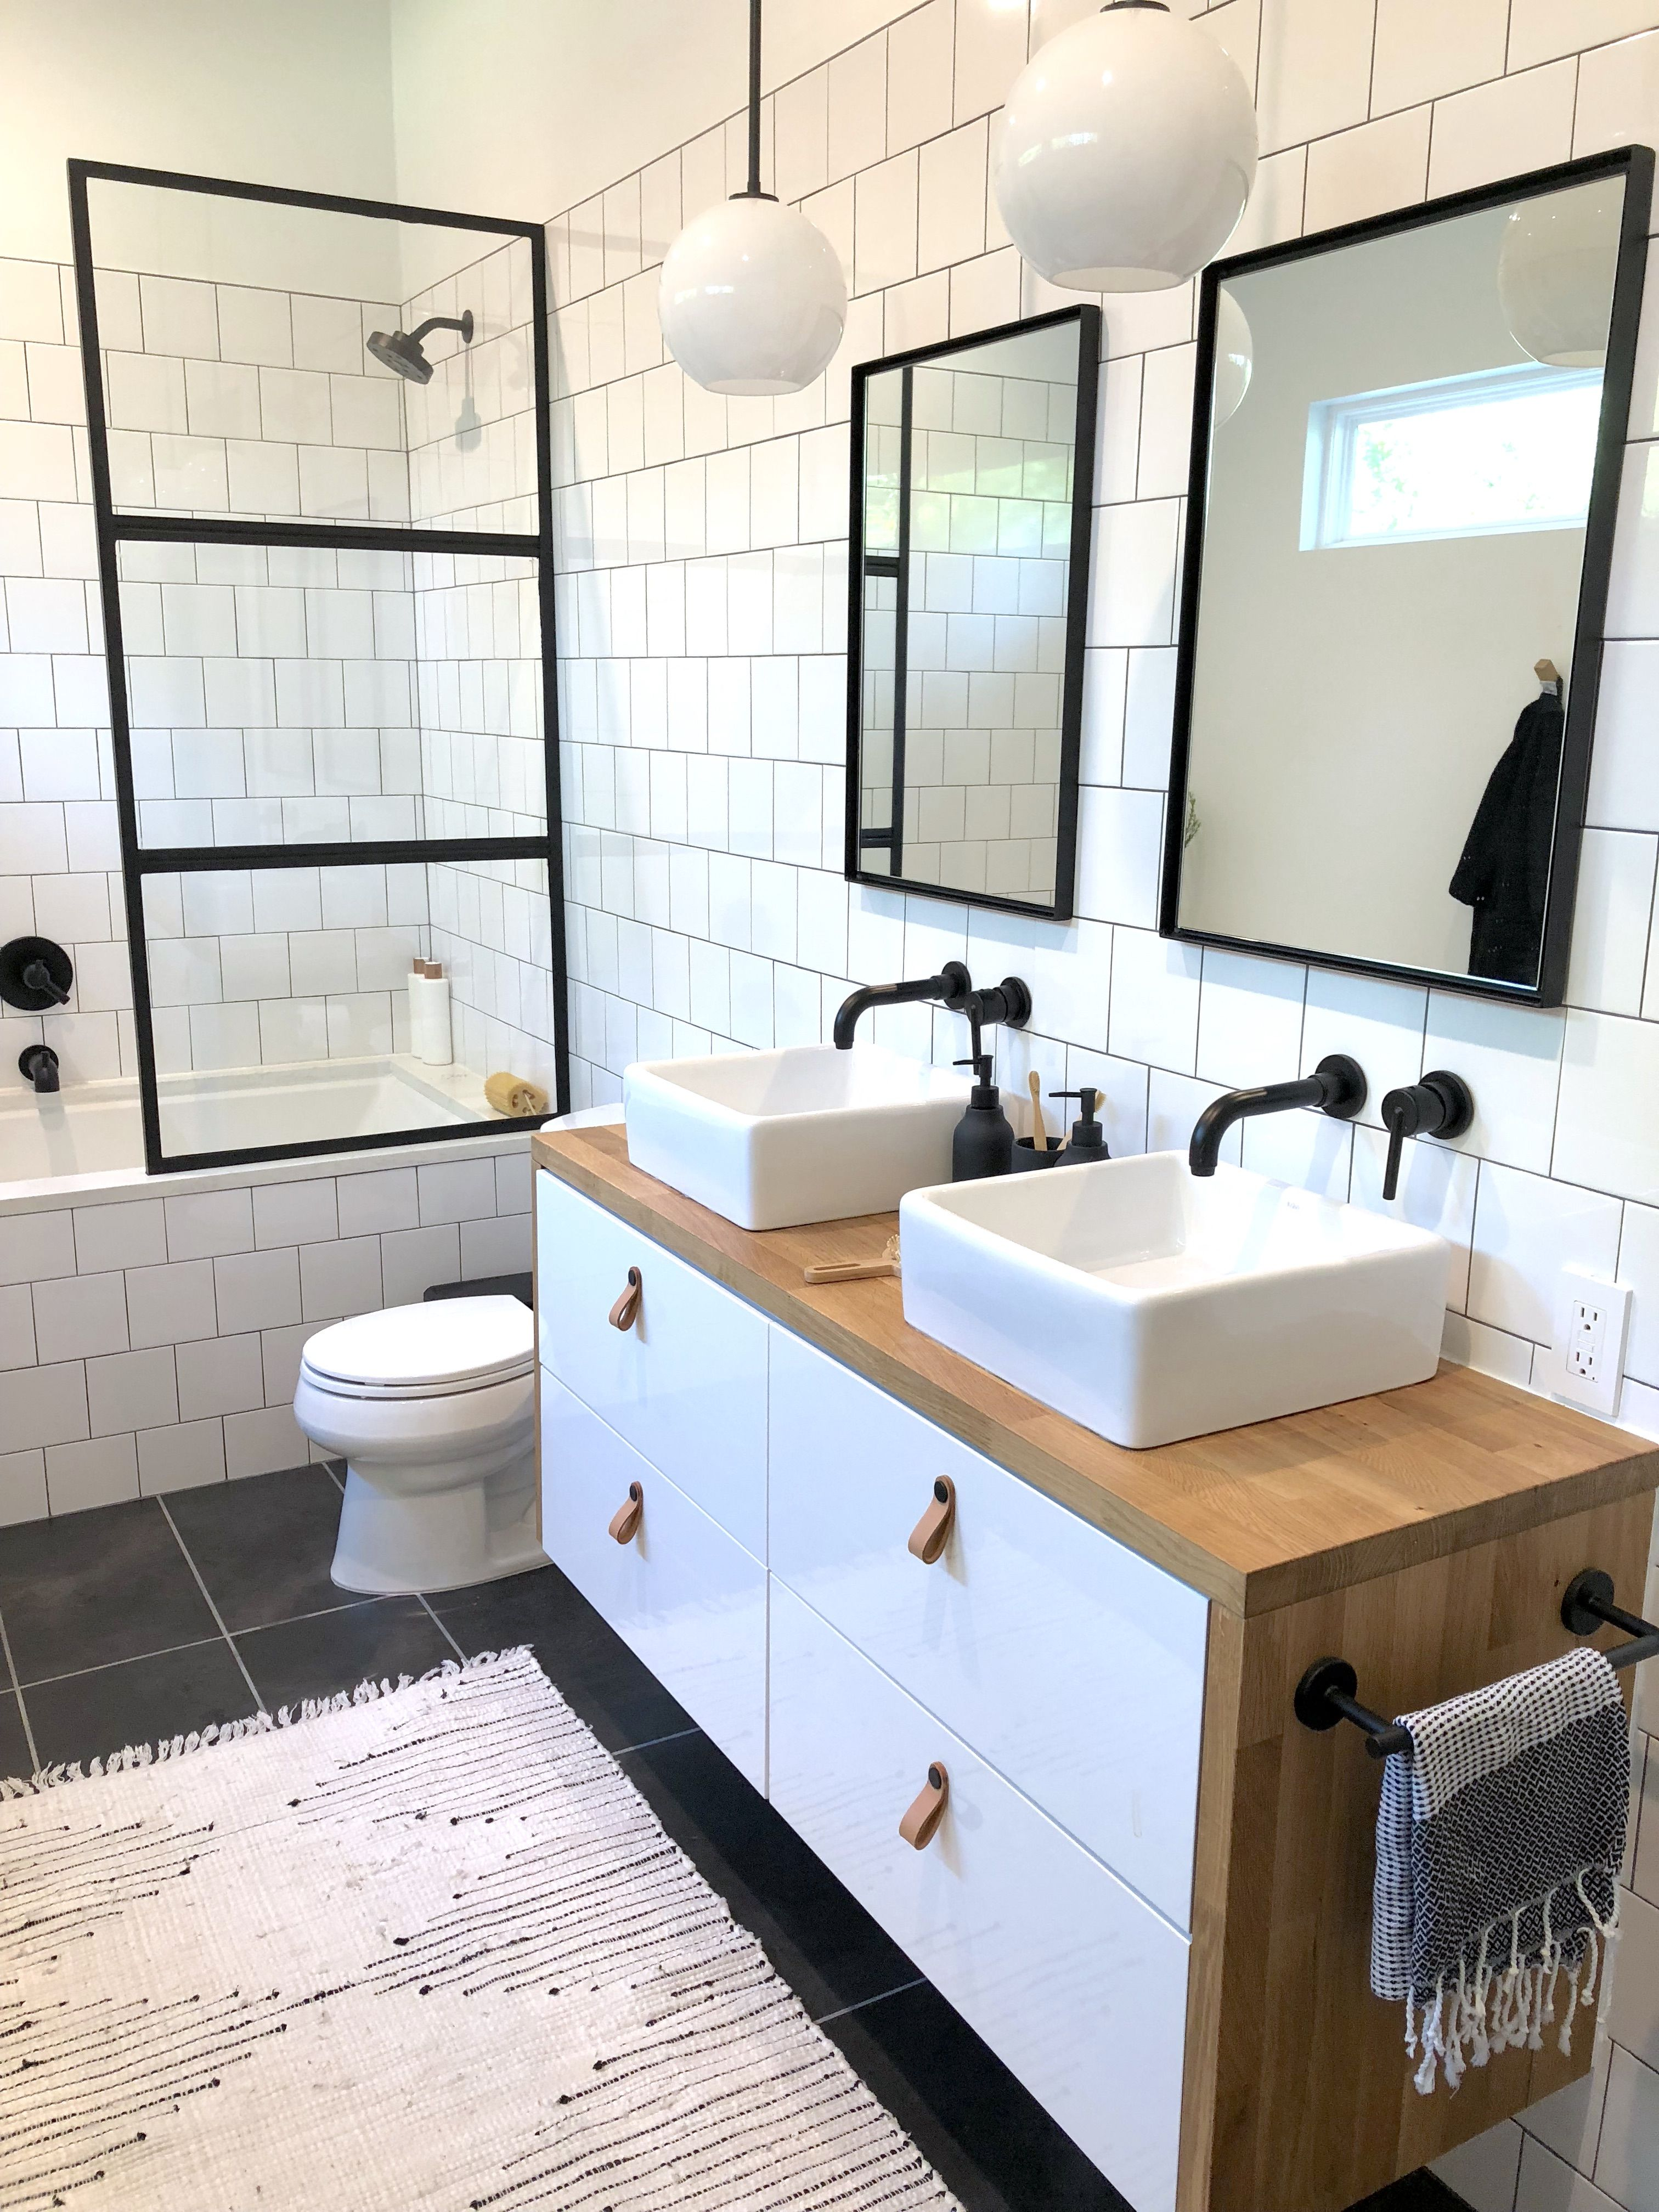 4 Money Saving Renovation Hacks One Design Blogger Swears By